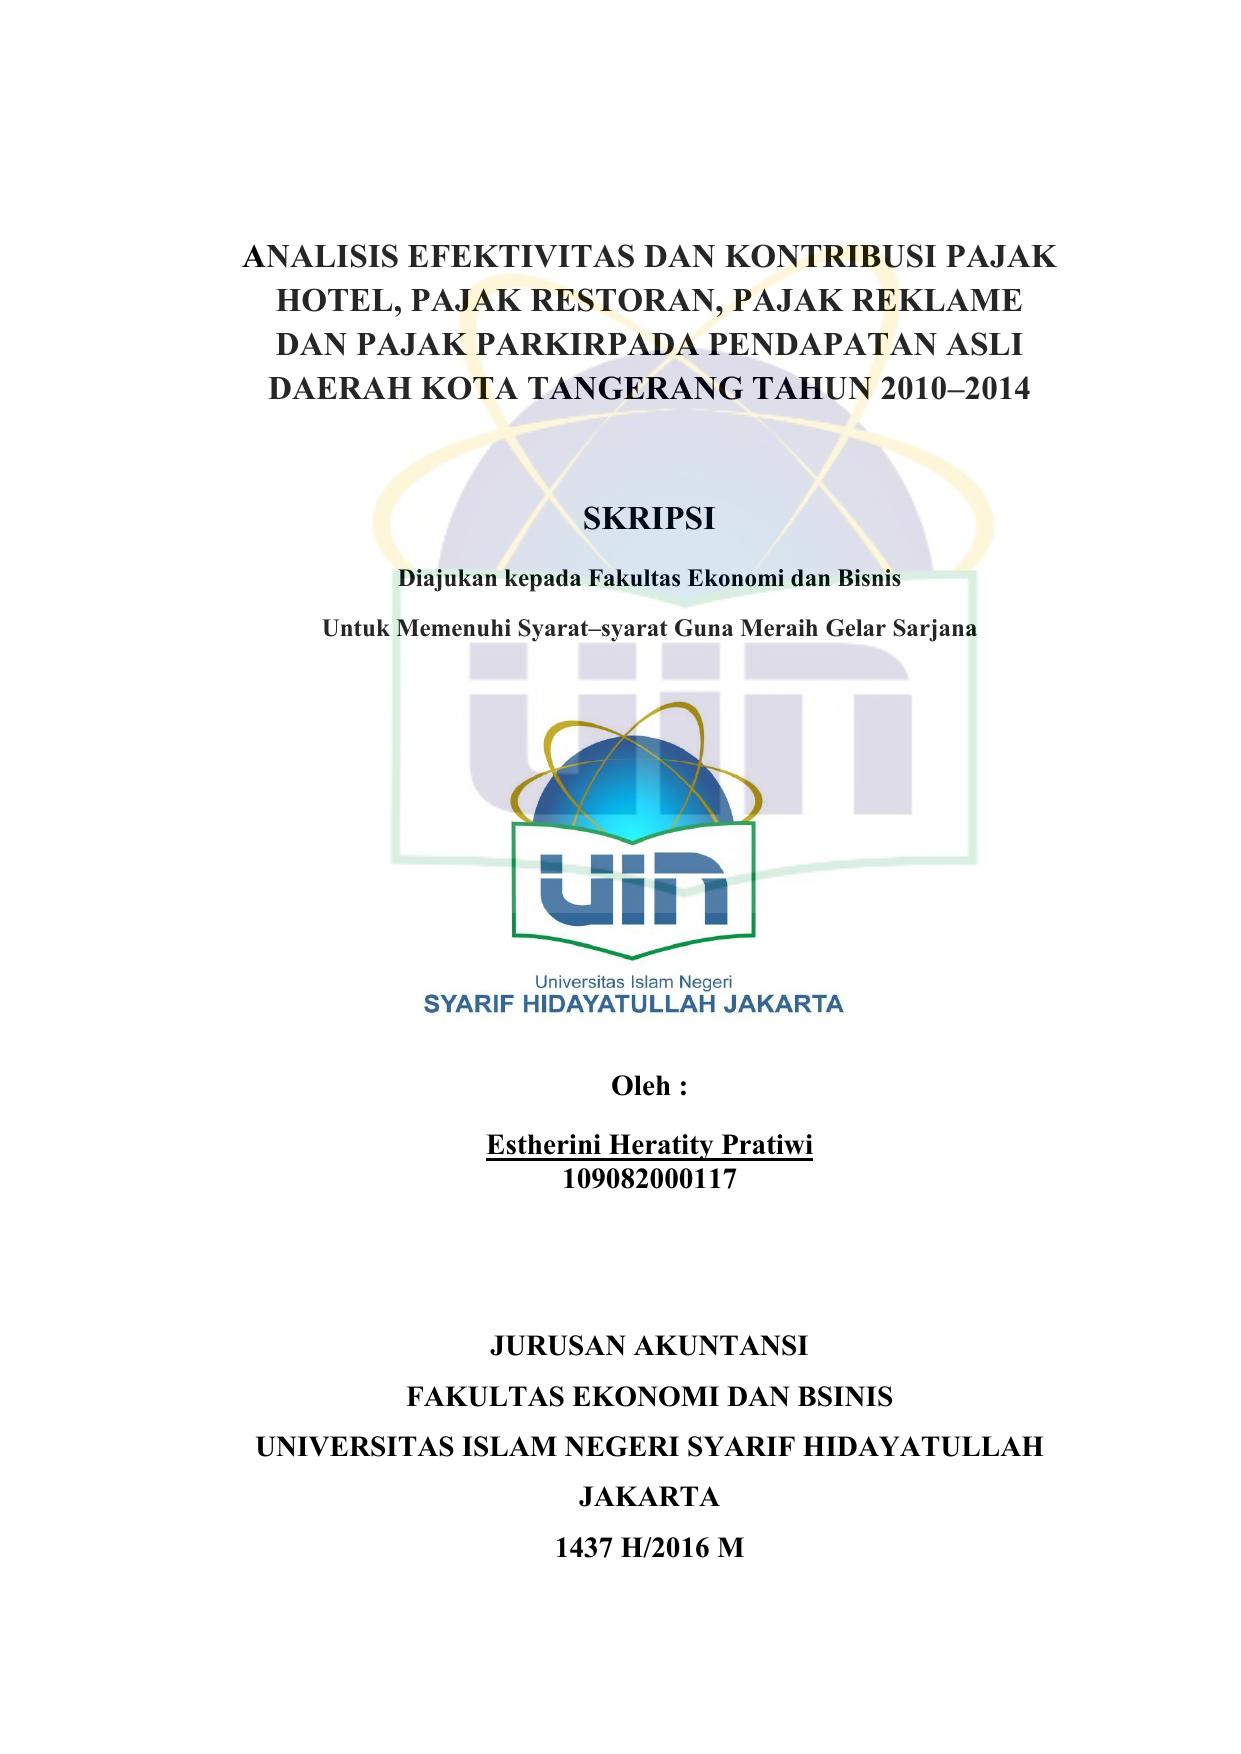 Analisis Efektivitas Dan Kontribusi Pajak Hotel Pajak